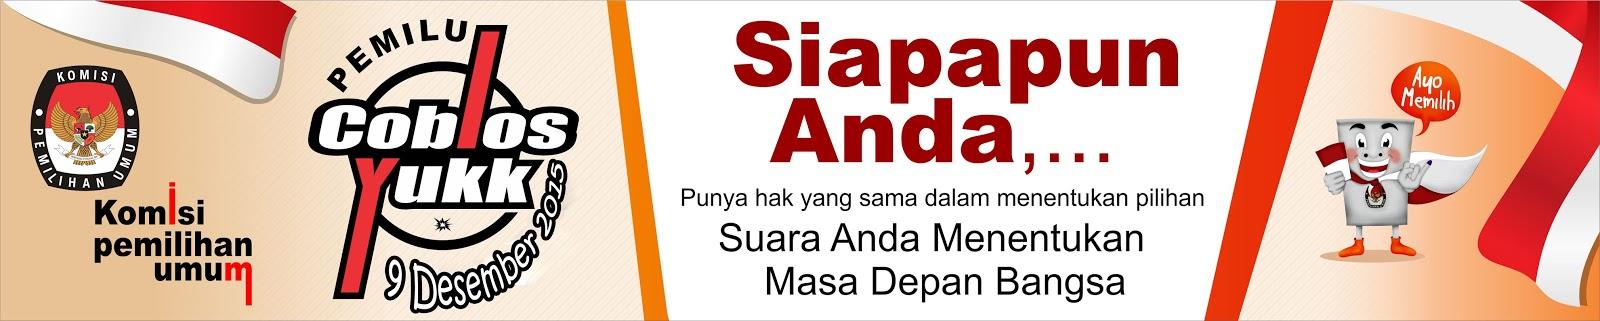 Liputan Berita Online Terkini Indonesia dan Dunia,Pilkada, pilwali, surabaya 2015